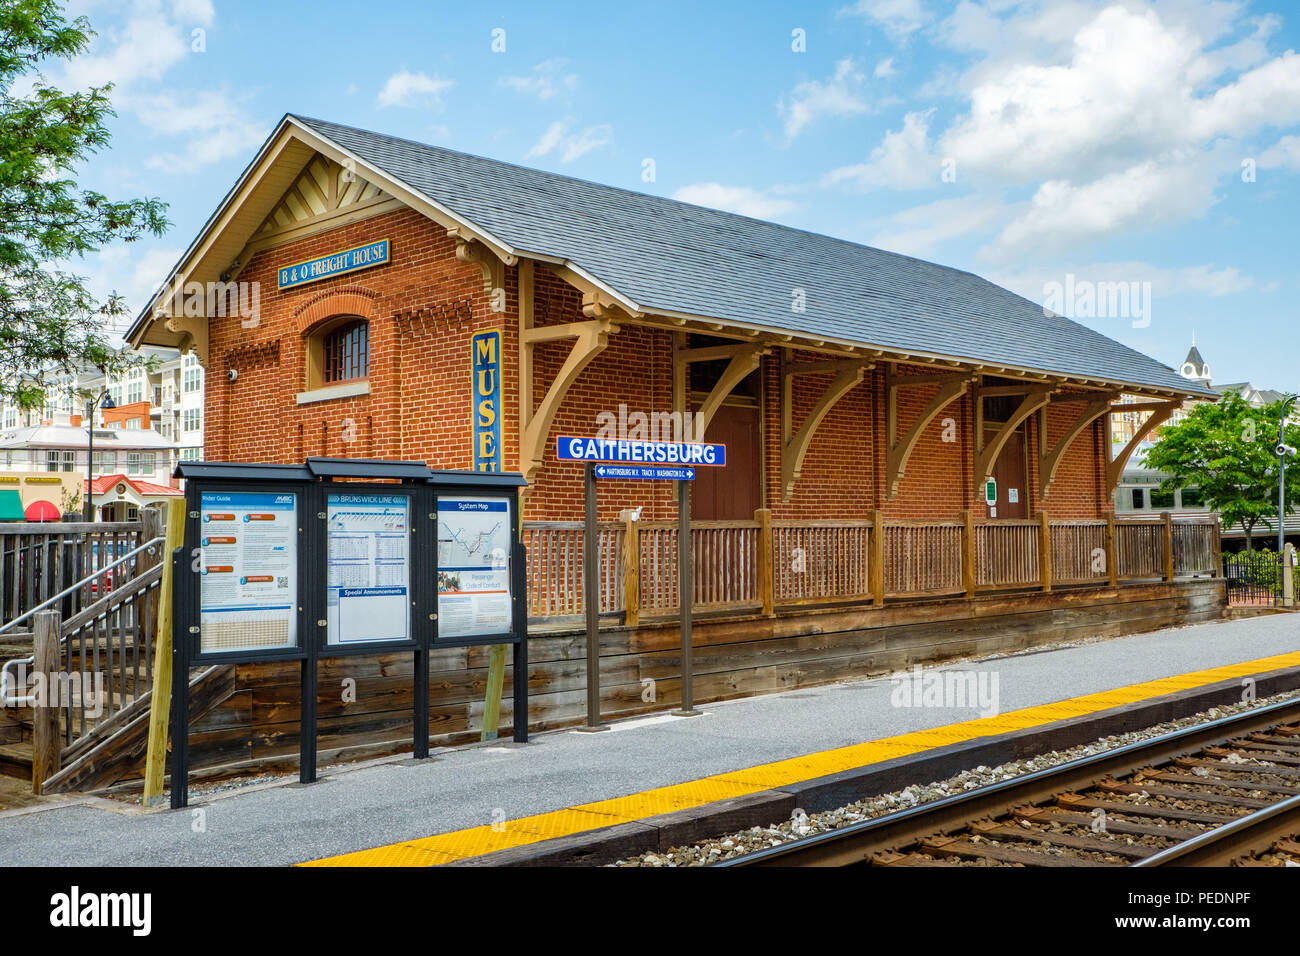 Freight Shed, Gaithersburg Railroad Station, 5 South Summit Avenue, Gaithersburg, Maryland - Stock Image